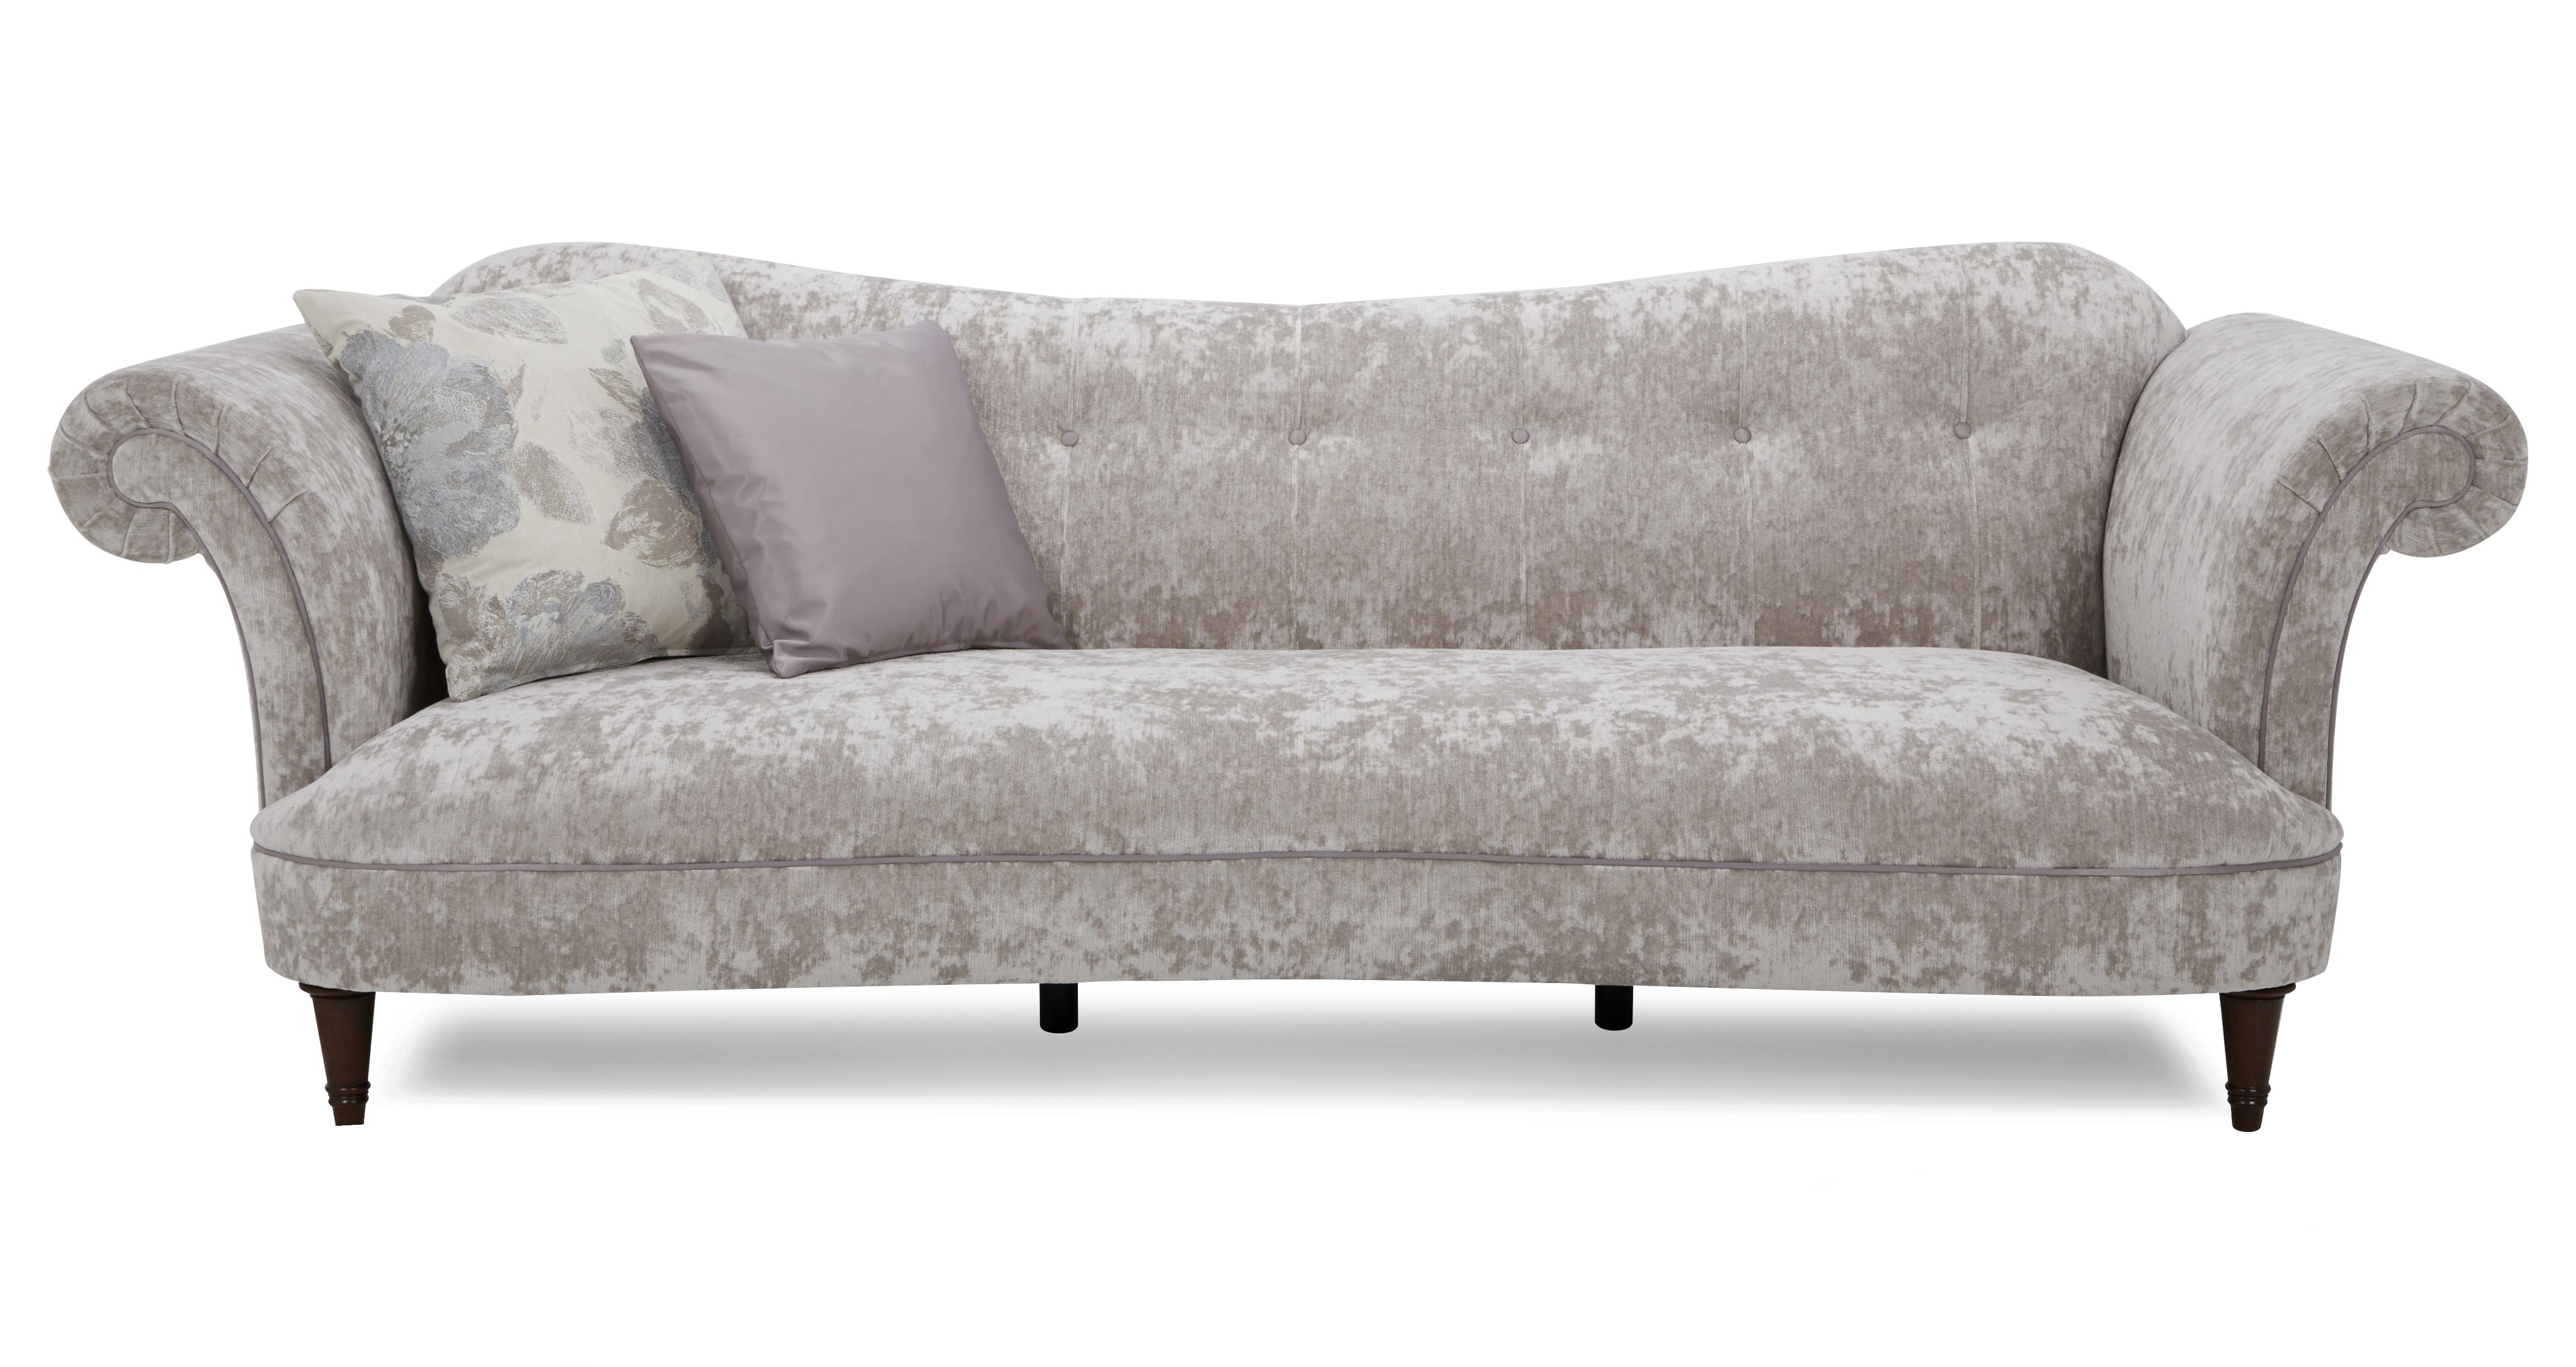 sofa 4 seater long table moray velvet alternative dfs ireland